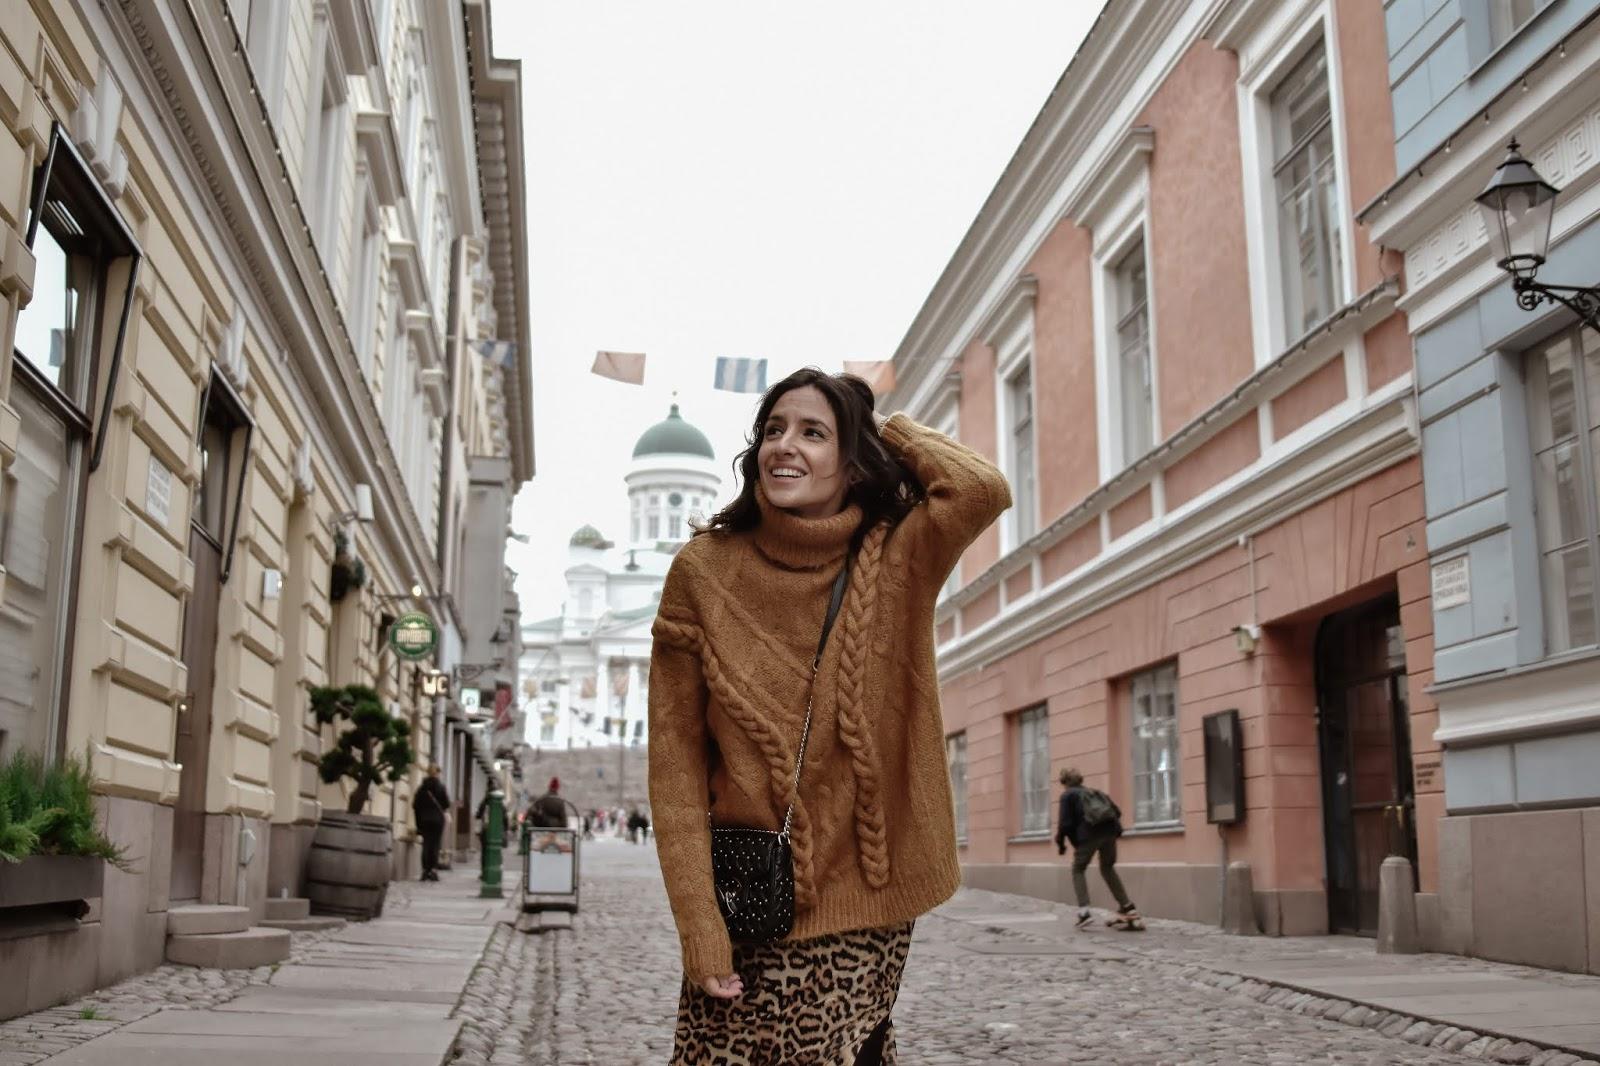 el-blog-de-silvia-rodriguez-lifestyle-travel-finlandia-helsinki-leopard-skirt-blogger-influencer